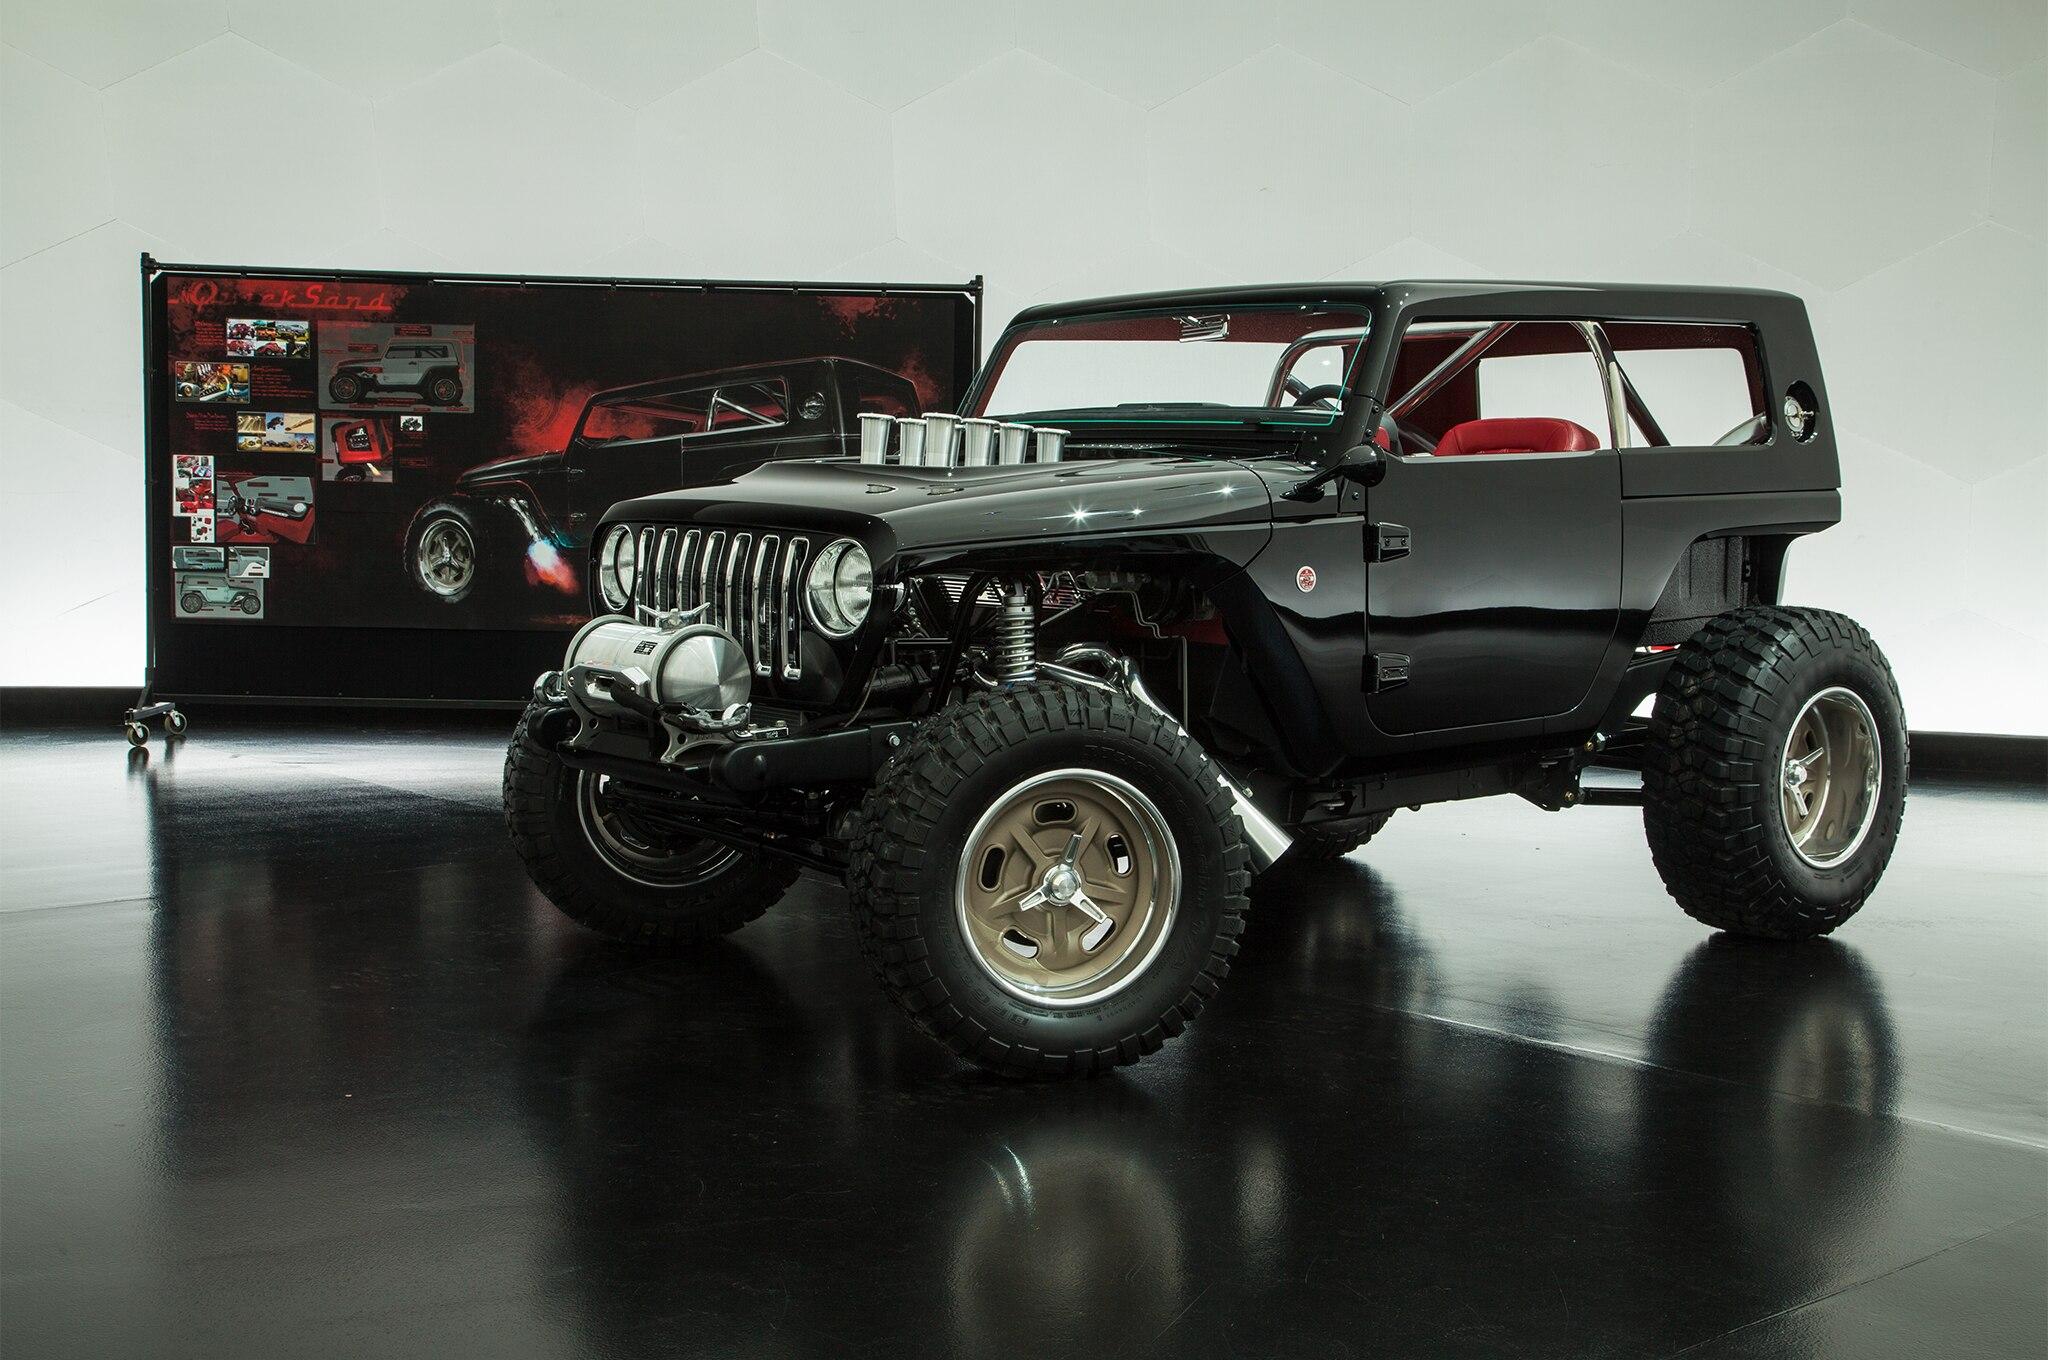 2017 Moab Easter Jeep Safari Quicksand Concept Front Three Quarter 02